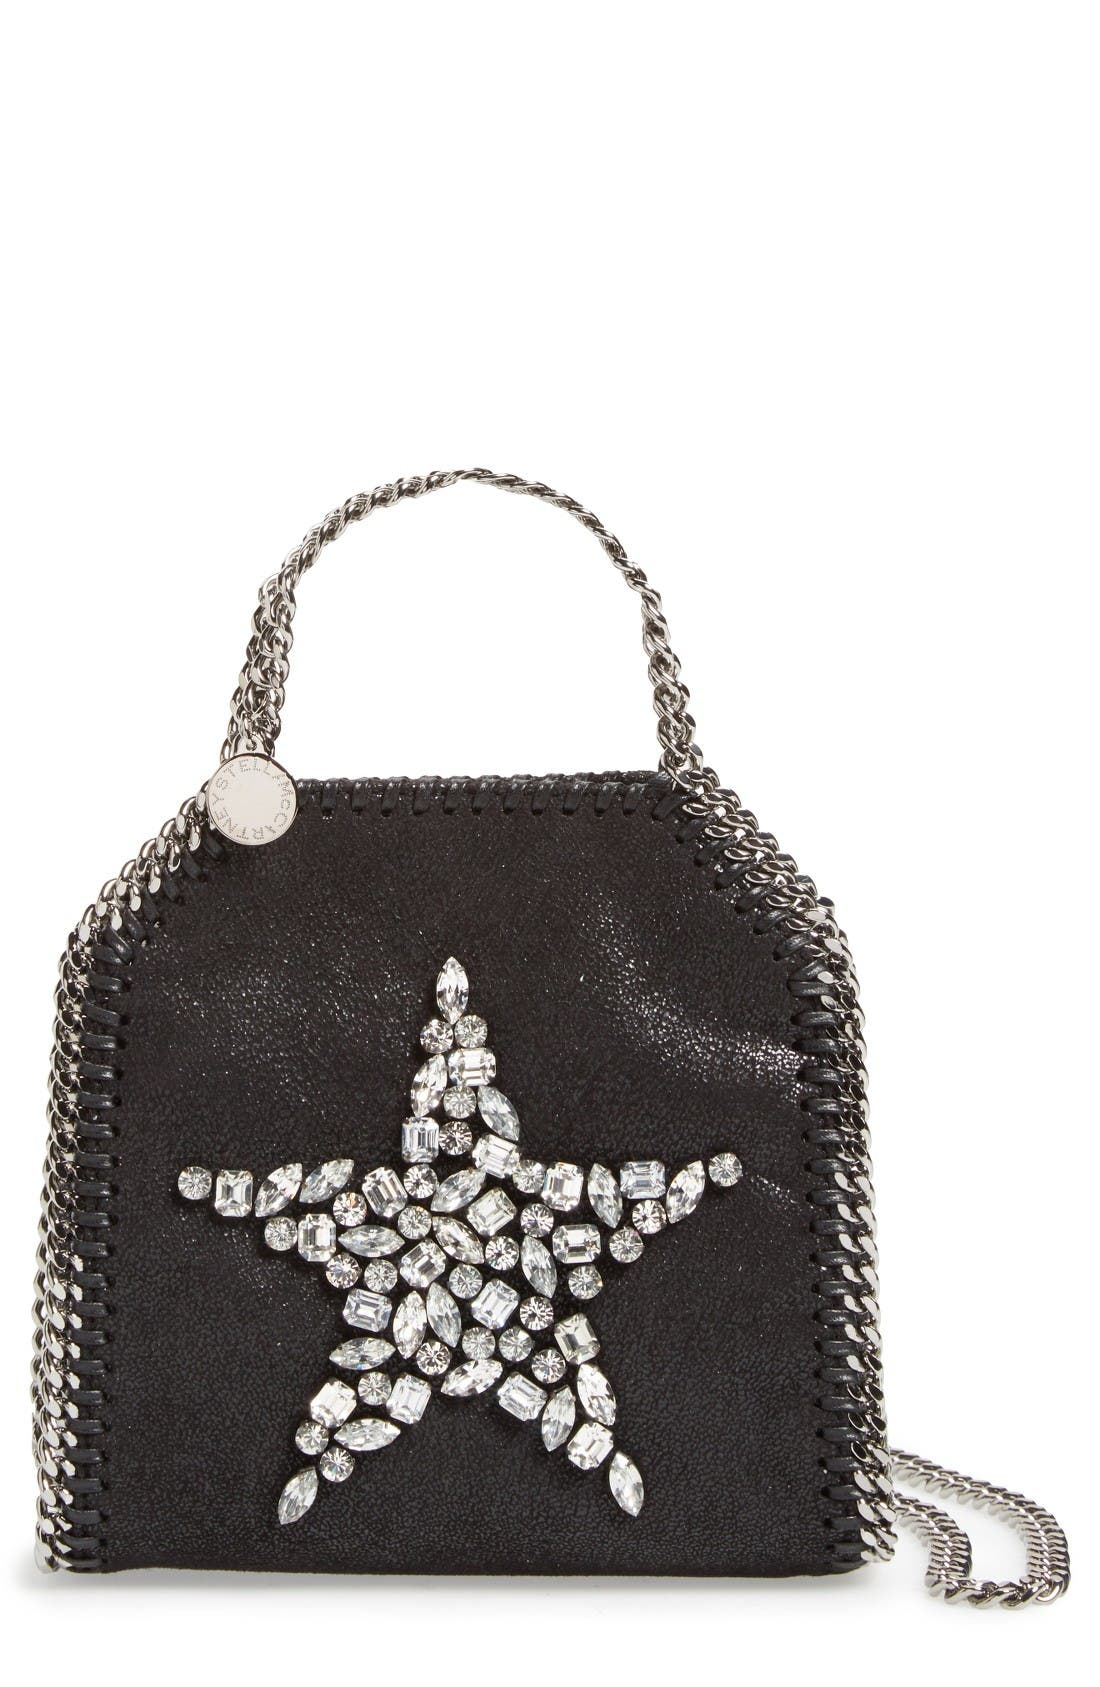 Main Image - Stella McCartney Tiny Falabella Faux Leather Crossbody Bag